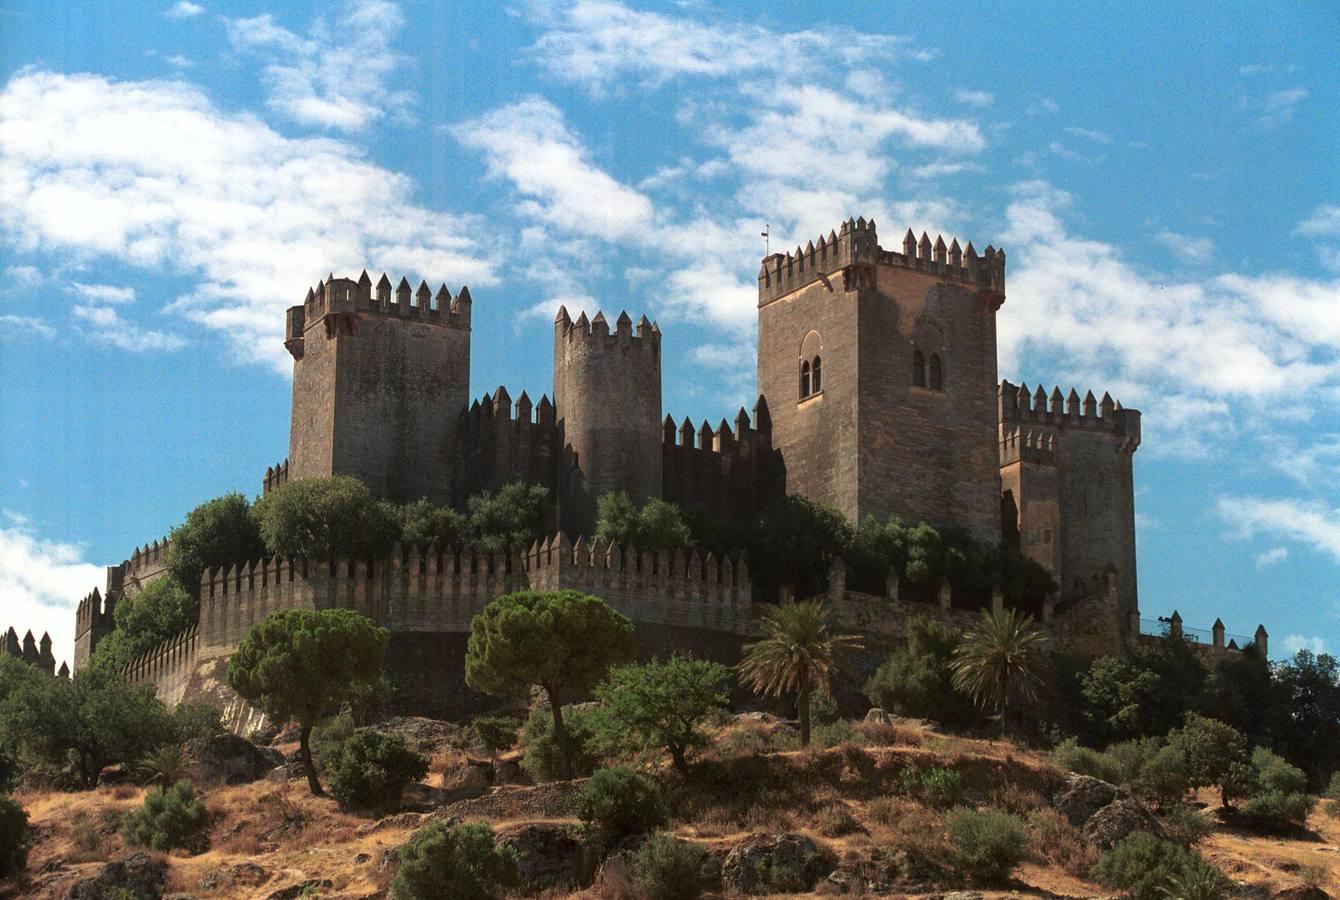 Fotos de leopoldo castillo 50